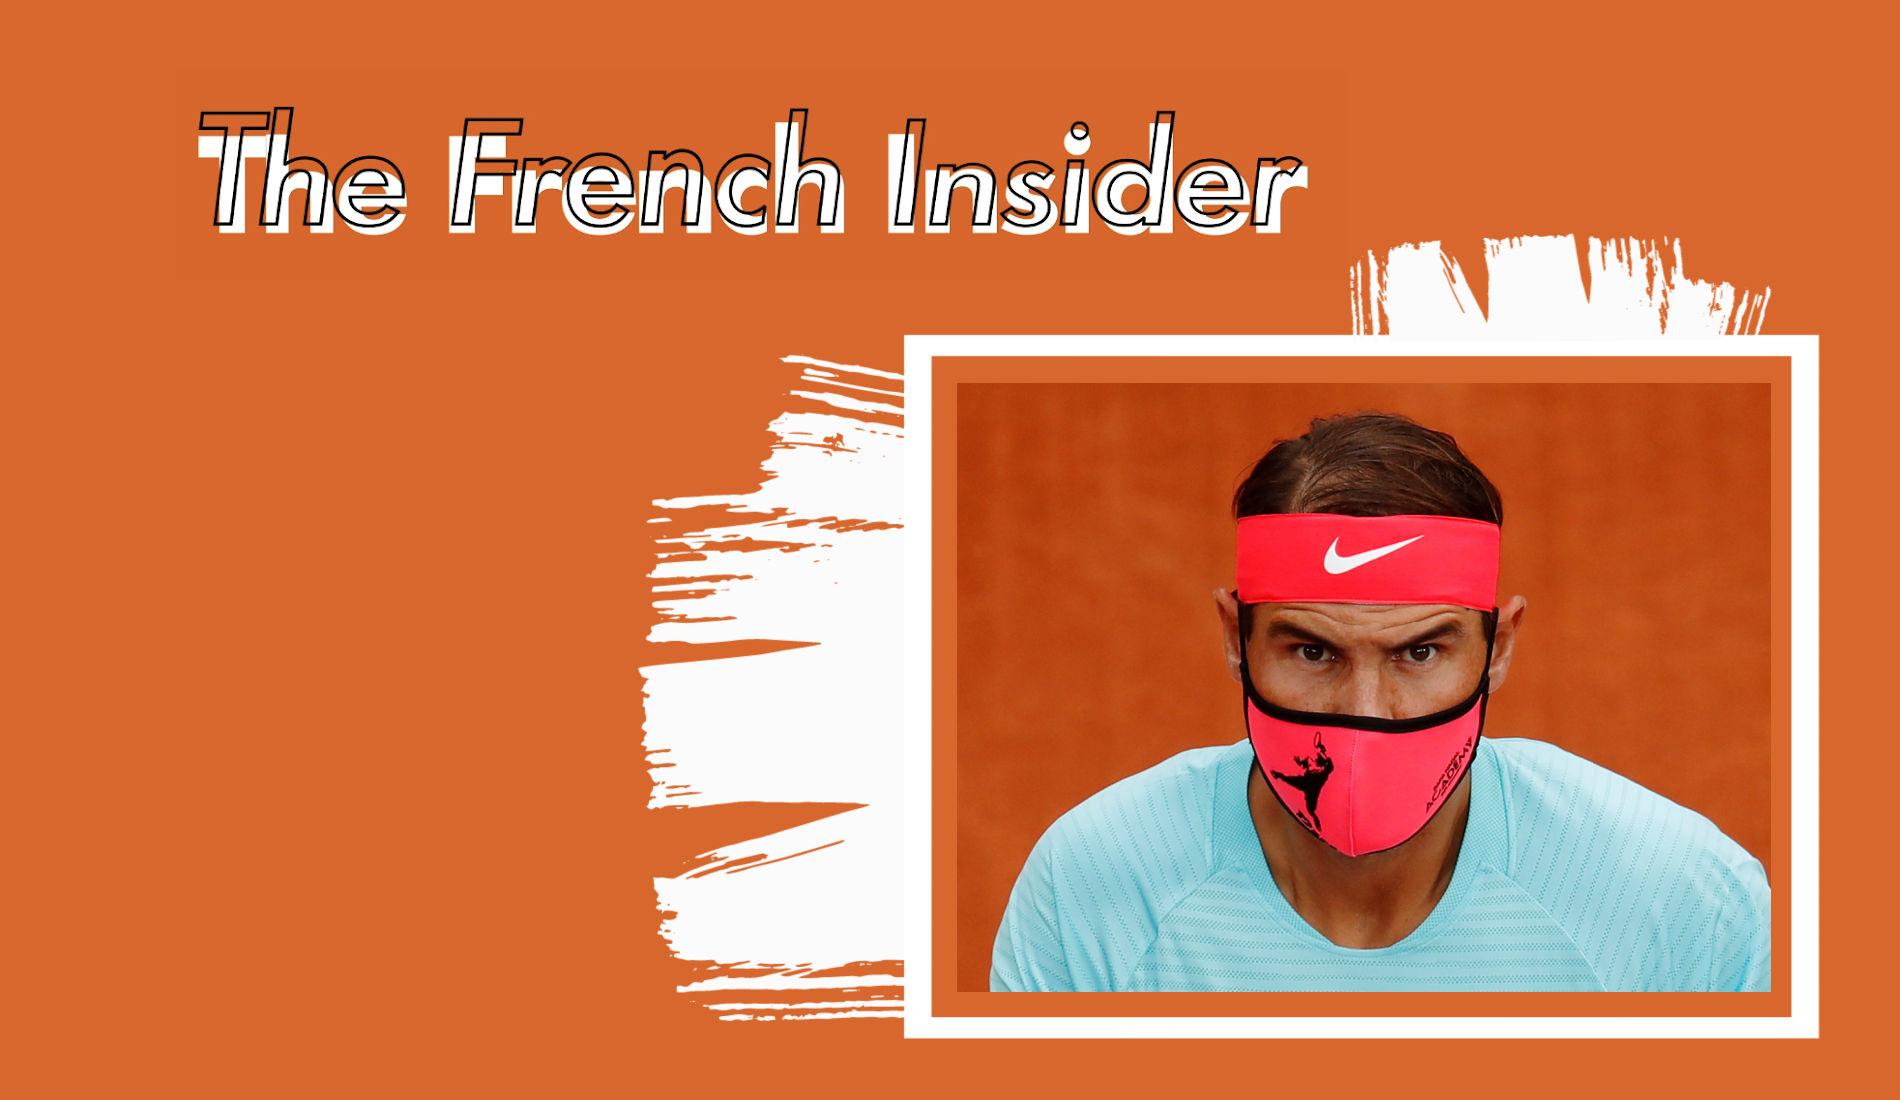 The French Insider #2 Ben Excerpt